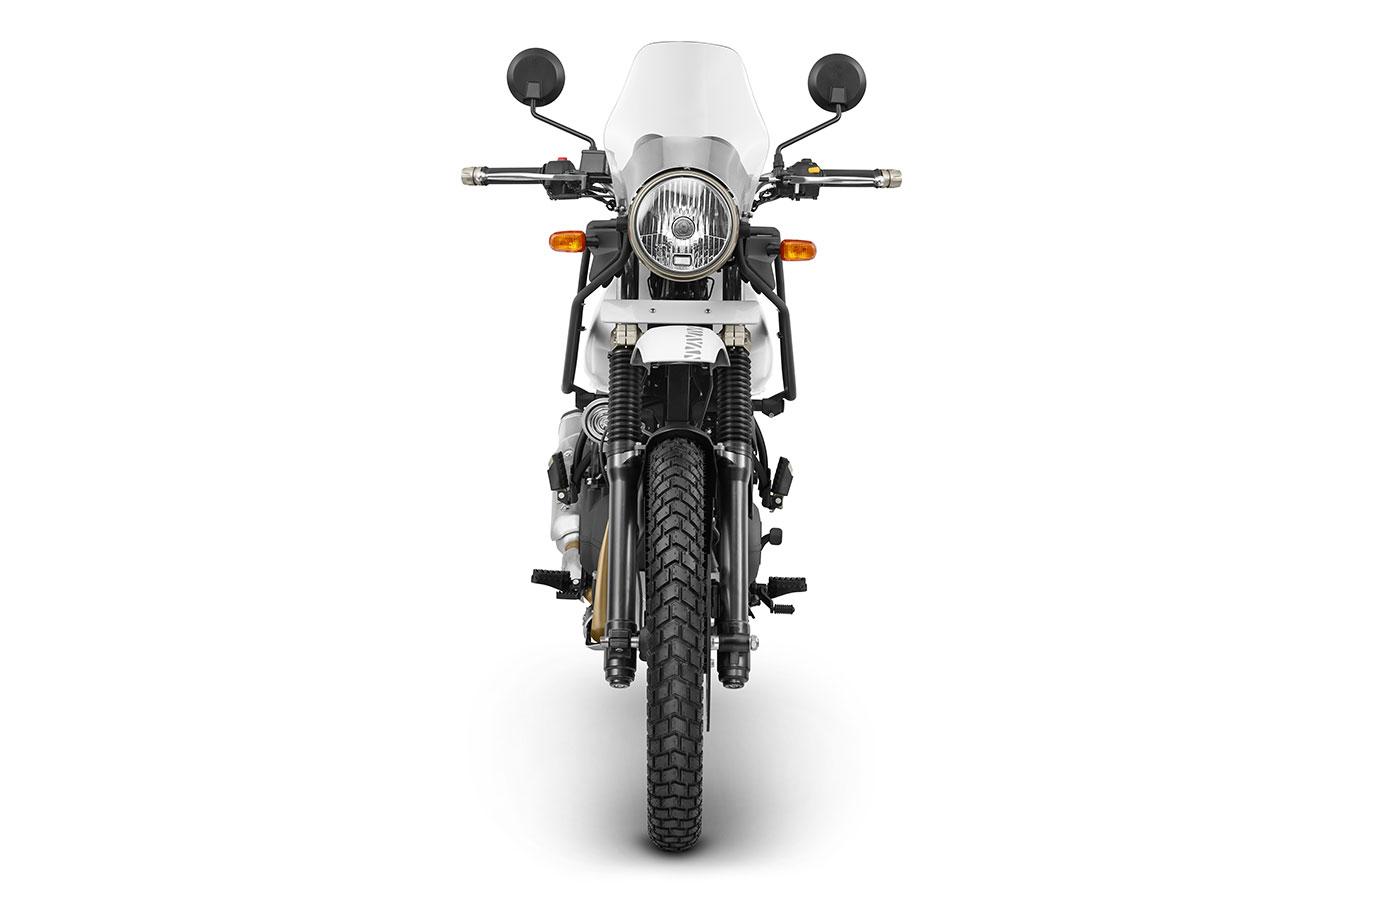 royalenfield-himalayan-bike-2